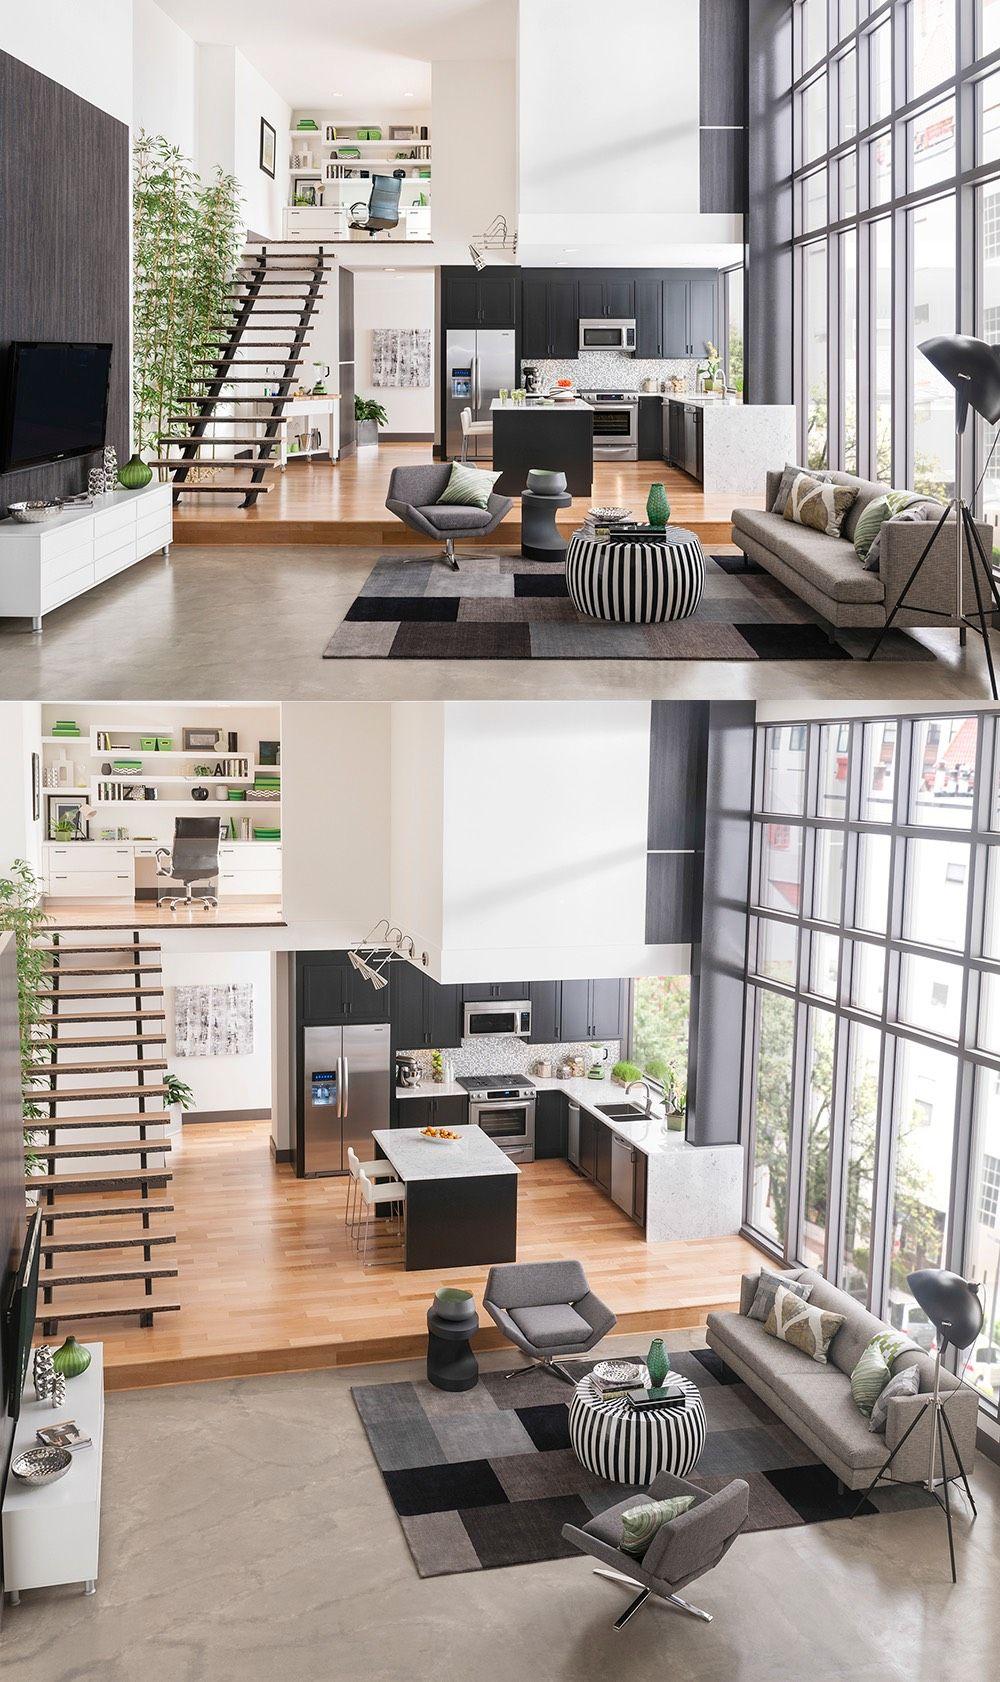 4 Duplex Lofts With Massive Windows Apartment Interior Loft